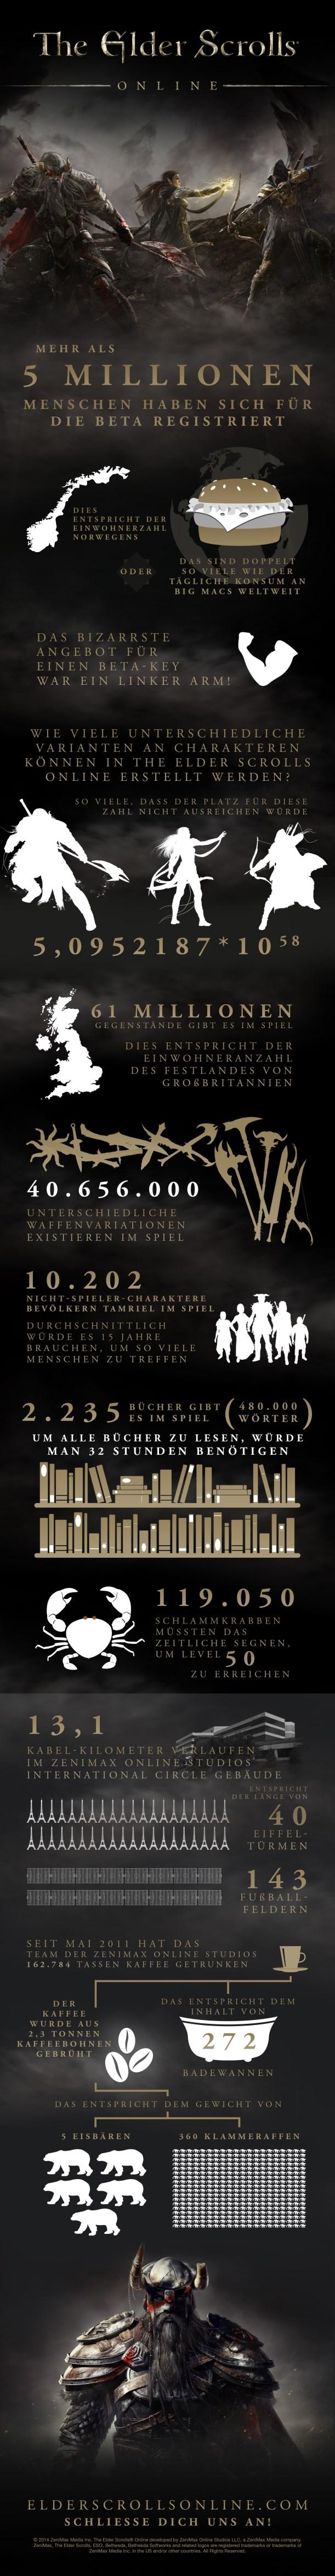 The Elder Scrolls Online Infografik